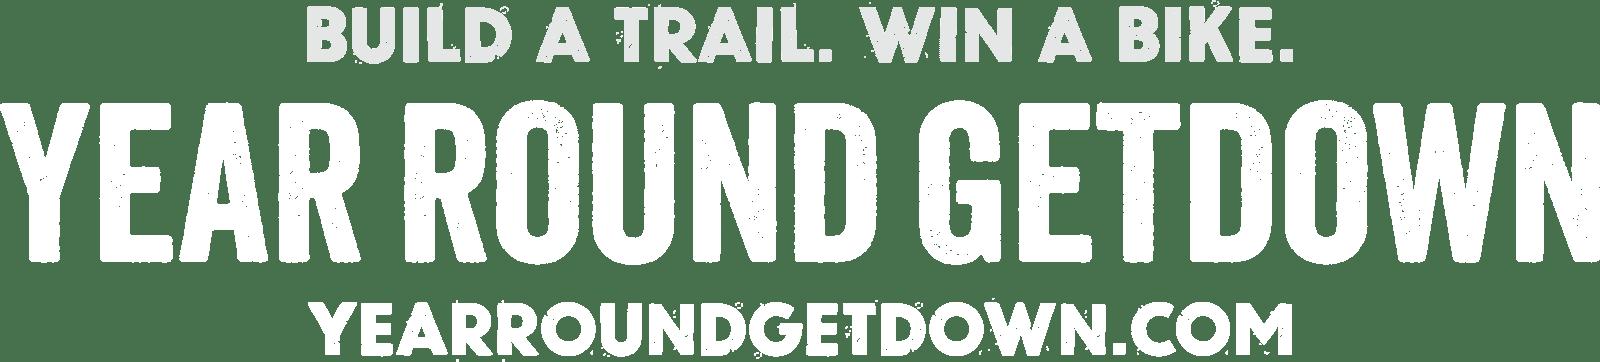 Year Round GetDown: Build a trail, win a bike.